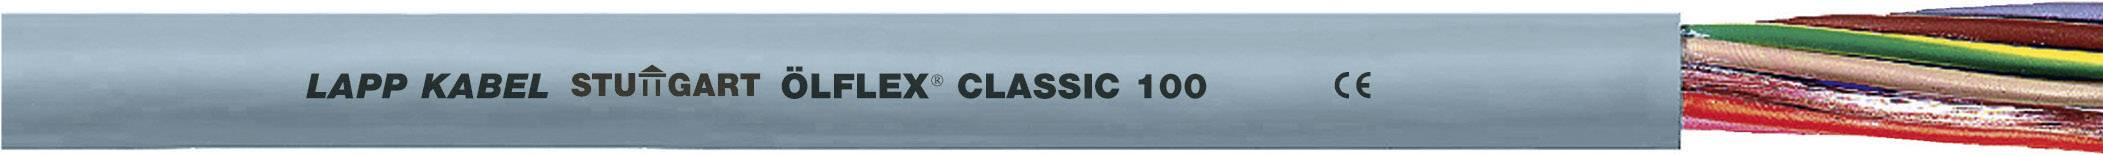 Kabel LappKabel Ölflex CLASSIC 100 6G0,5 (0010004), PVC, 6,7 mm, 500 V, šedá, 50 m